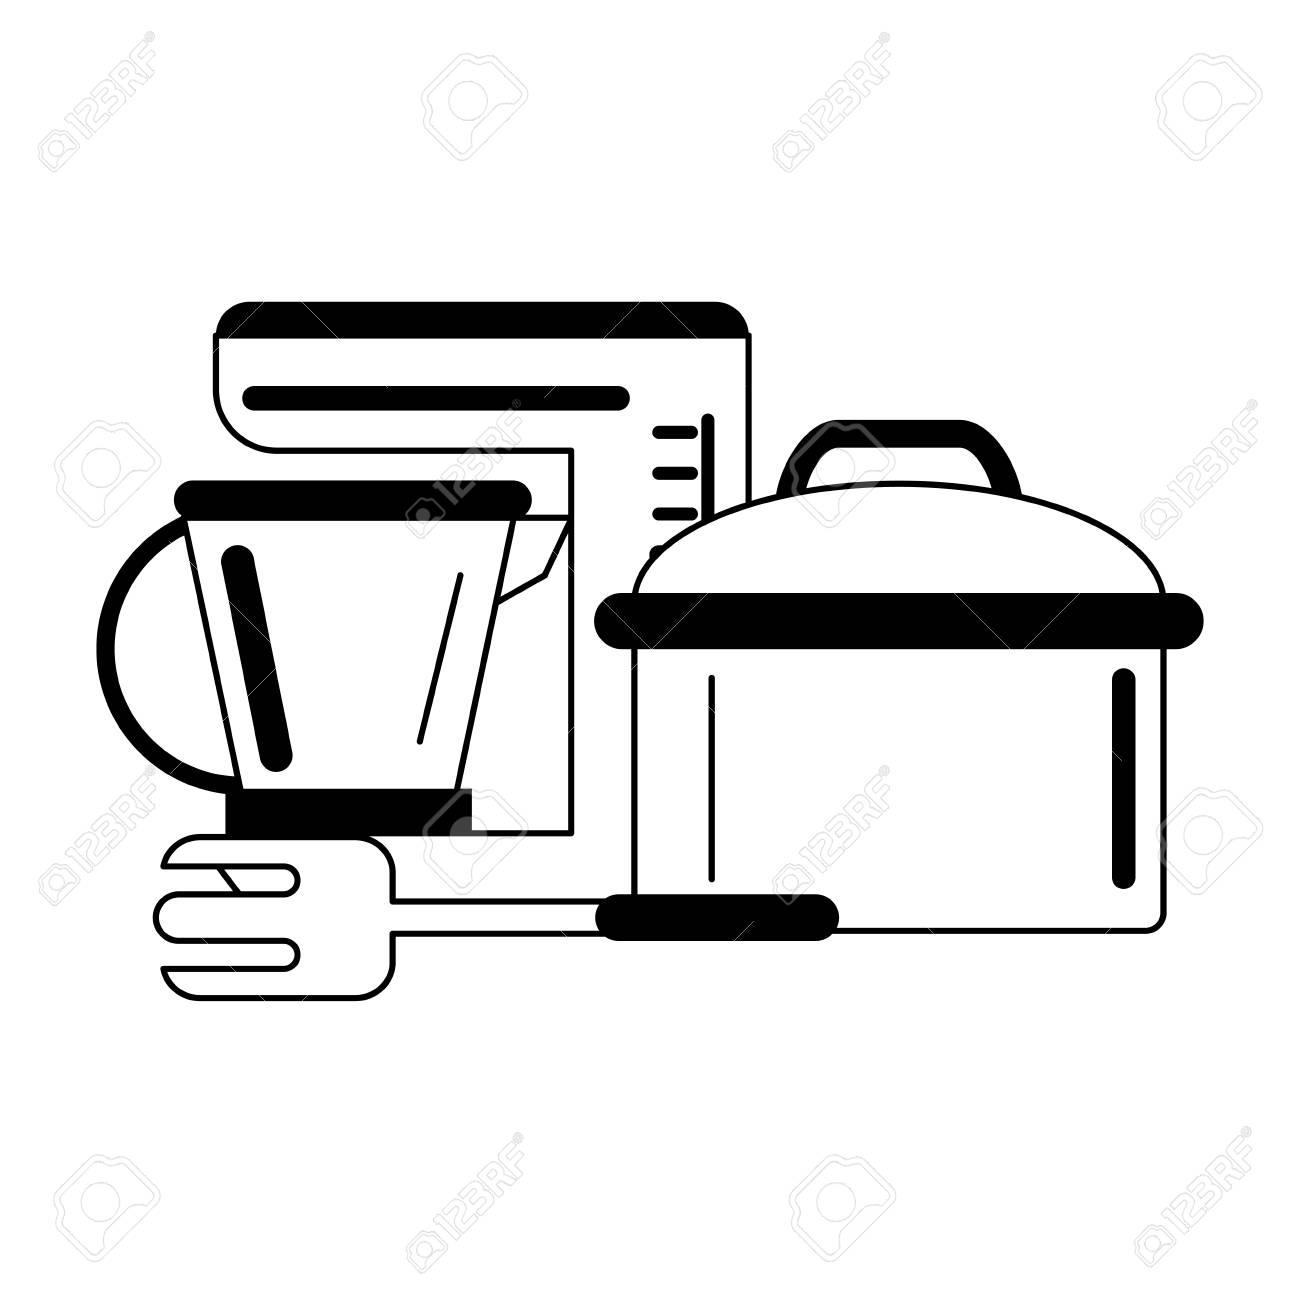 Kitchen Utensils And Supplies Cartoons Vector Illustration Graphic